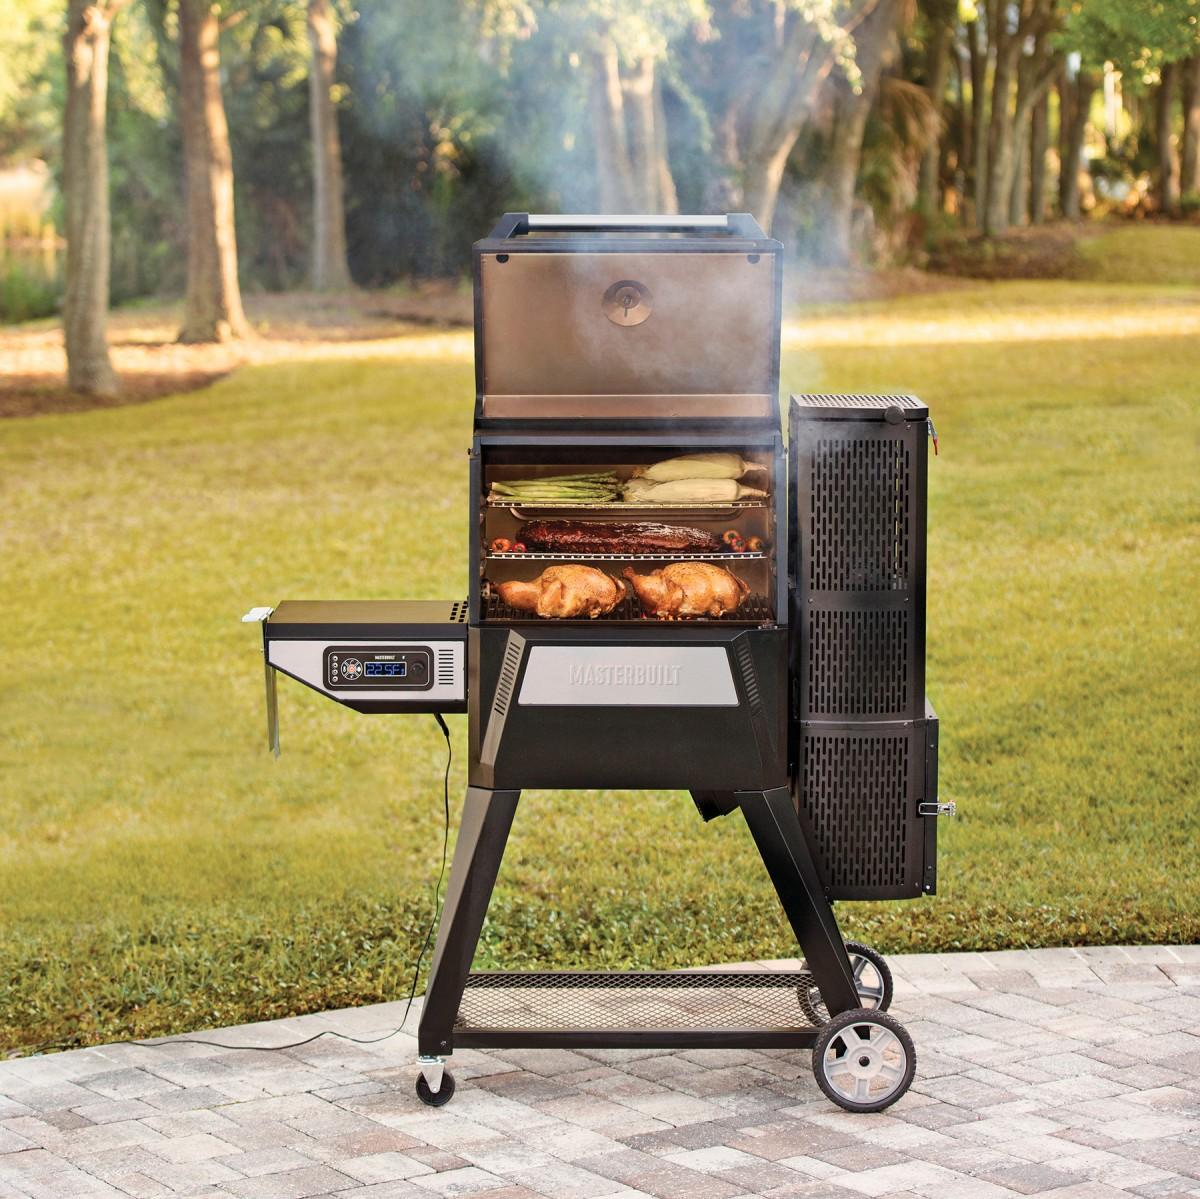 Masterbuilt Gravity Series™ 560 Digital Charcoal Grill + Smoker